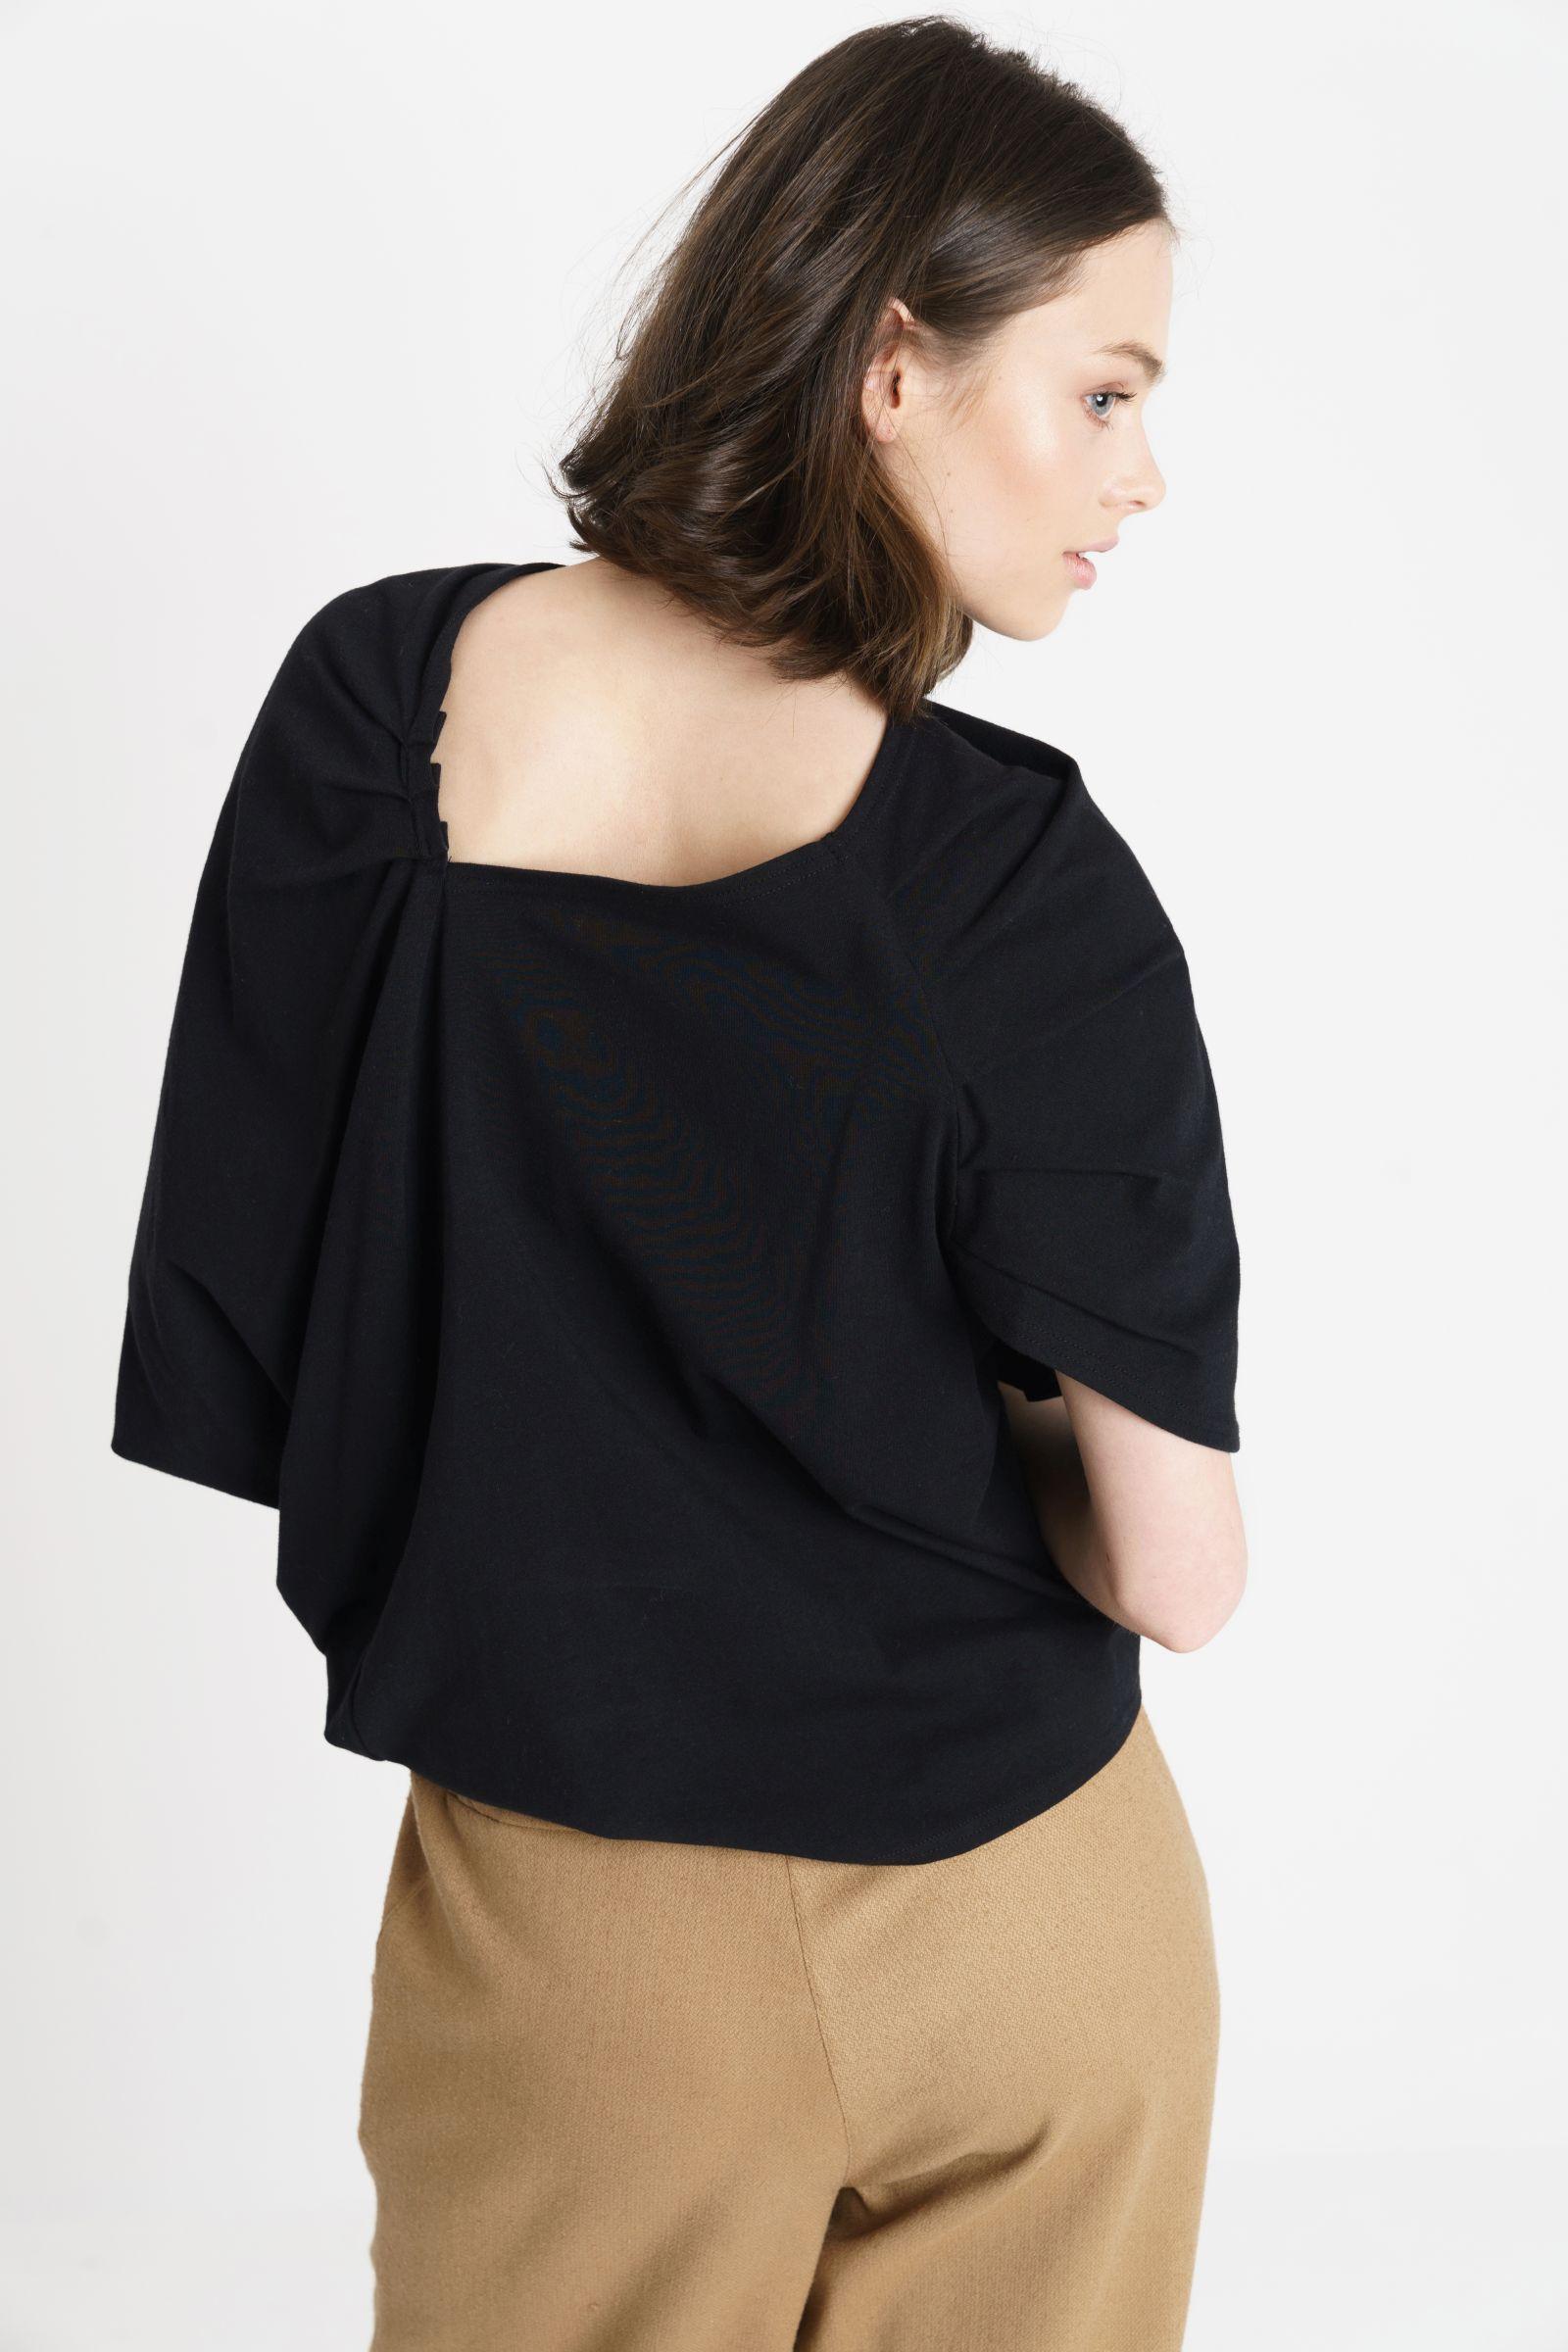 1-fairtrade-bluse-susan-draped-blouse-SS18-1-blacklROeq39a2qXZP